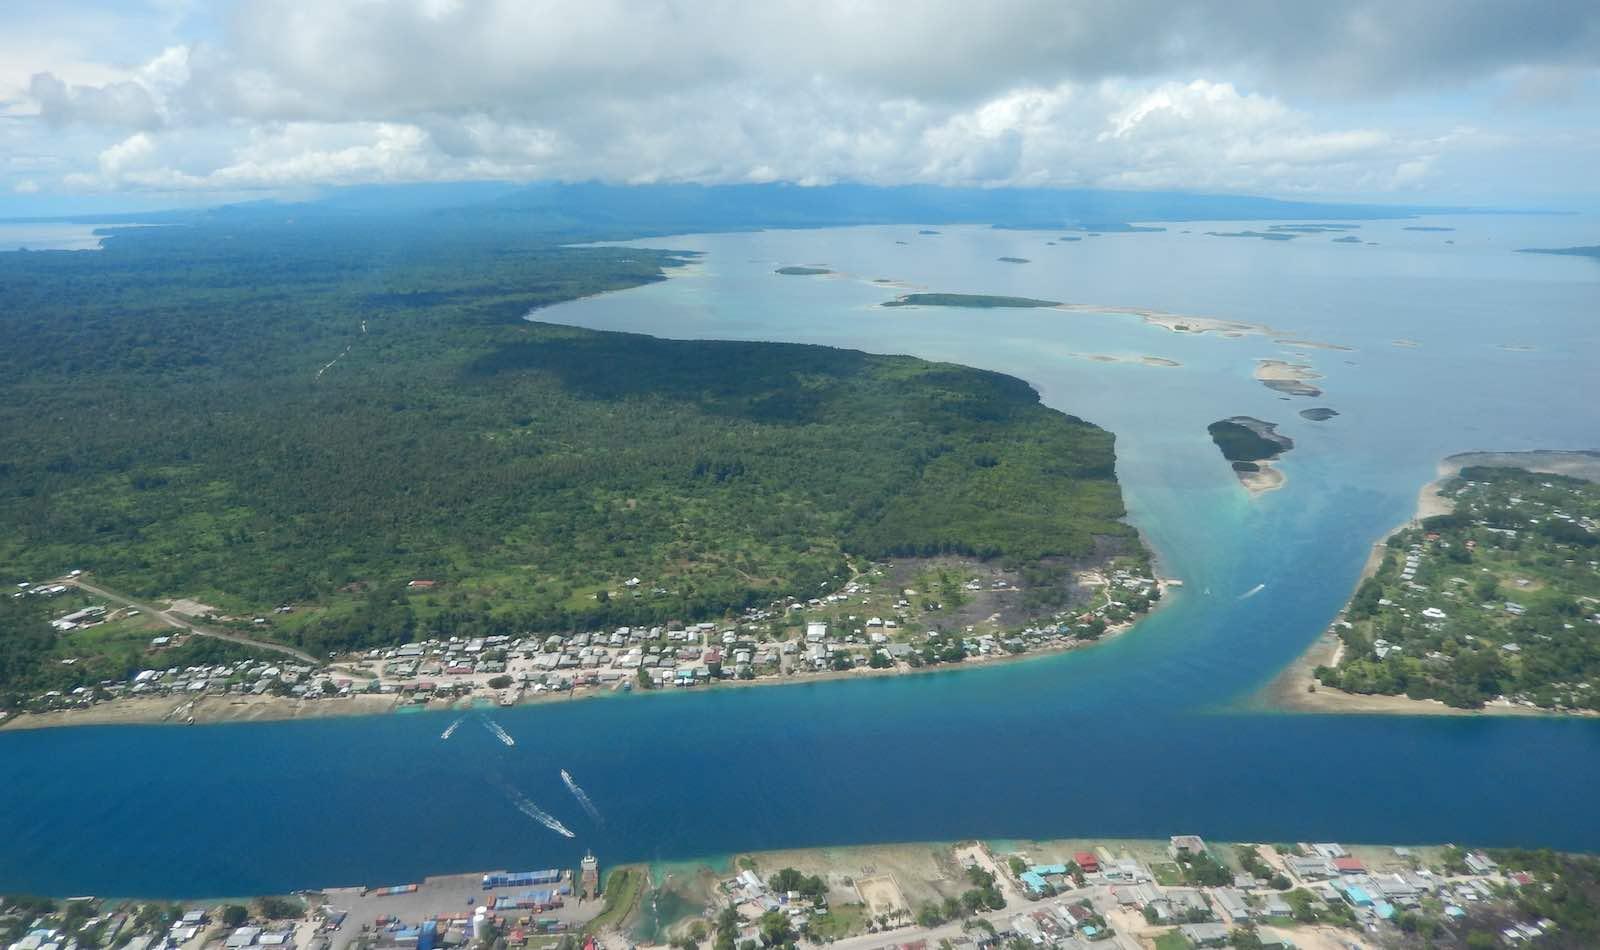 Buka, capital of Bougainville (Photo: Annmaree O'Keeffe)